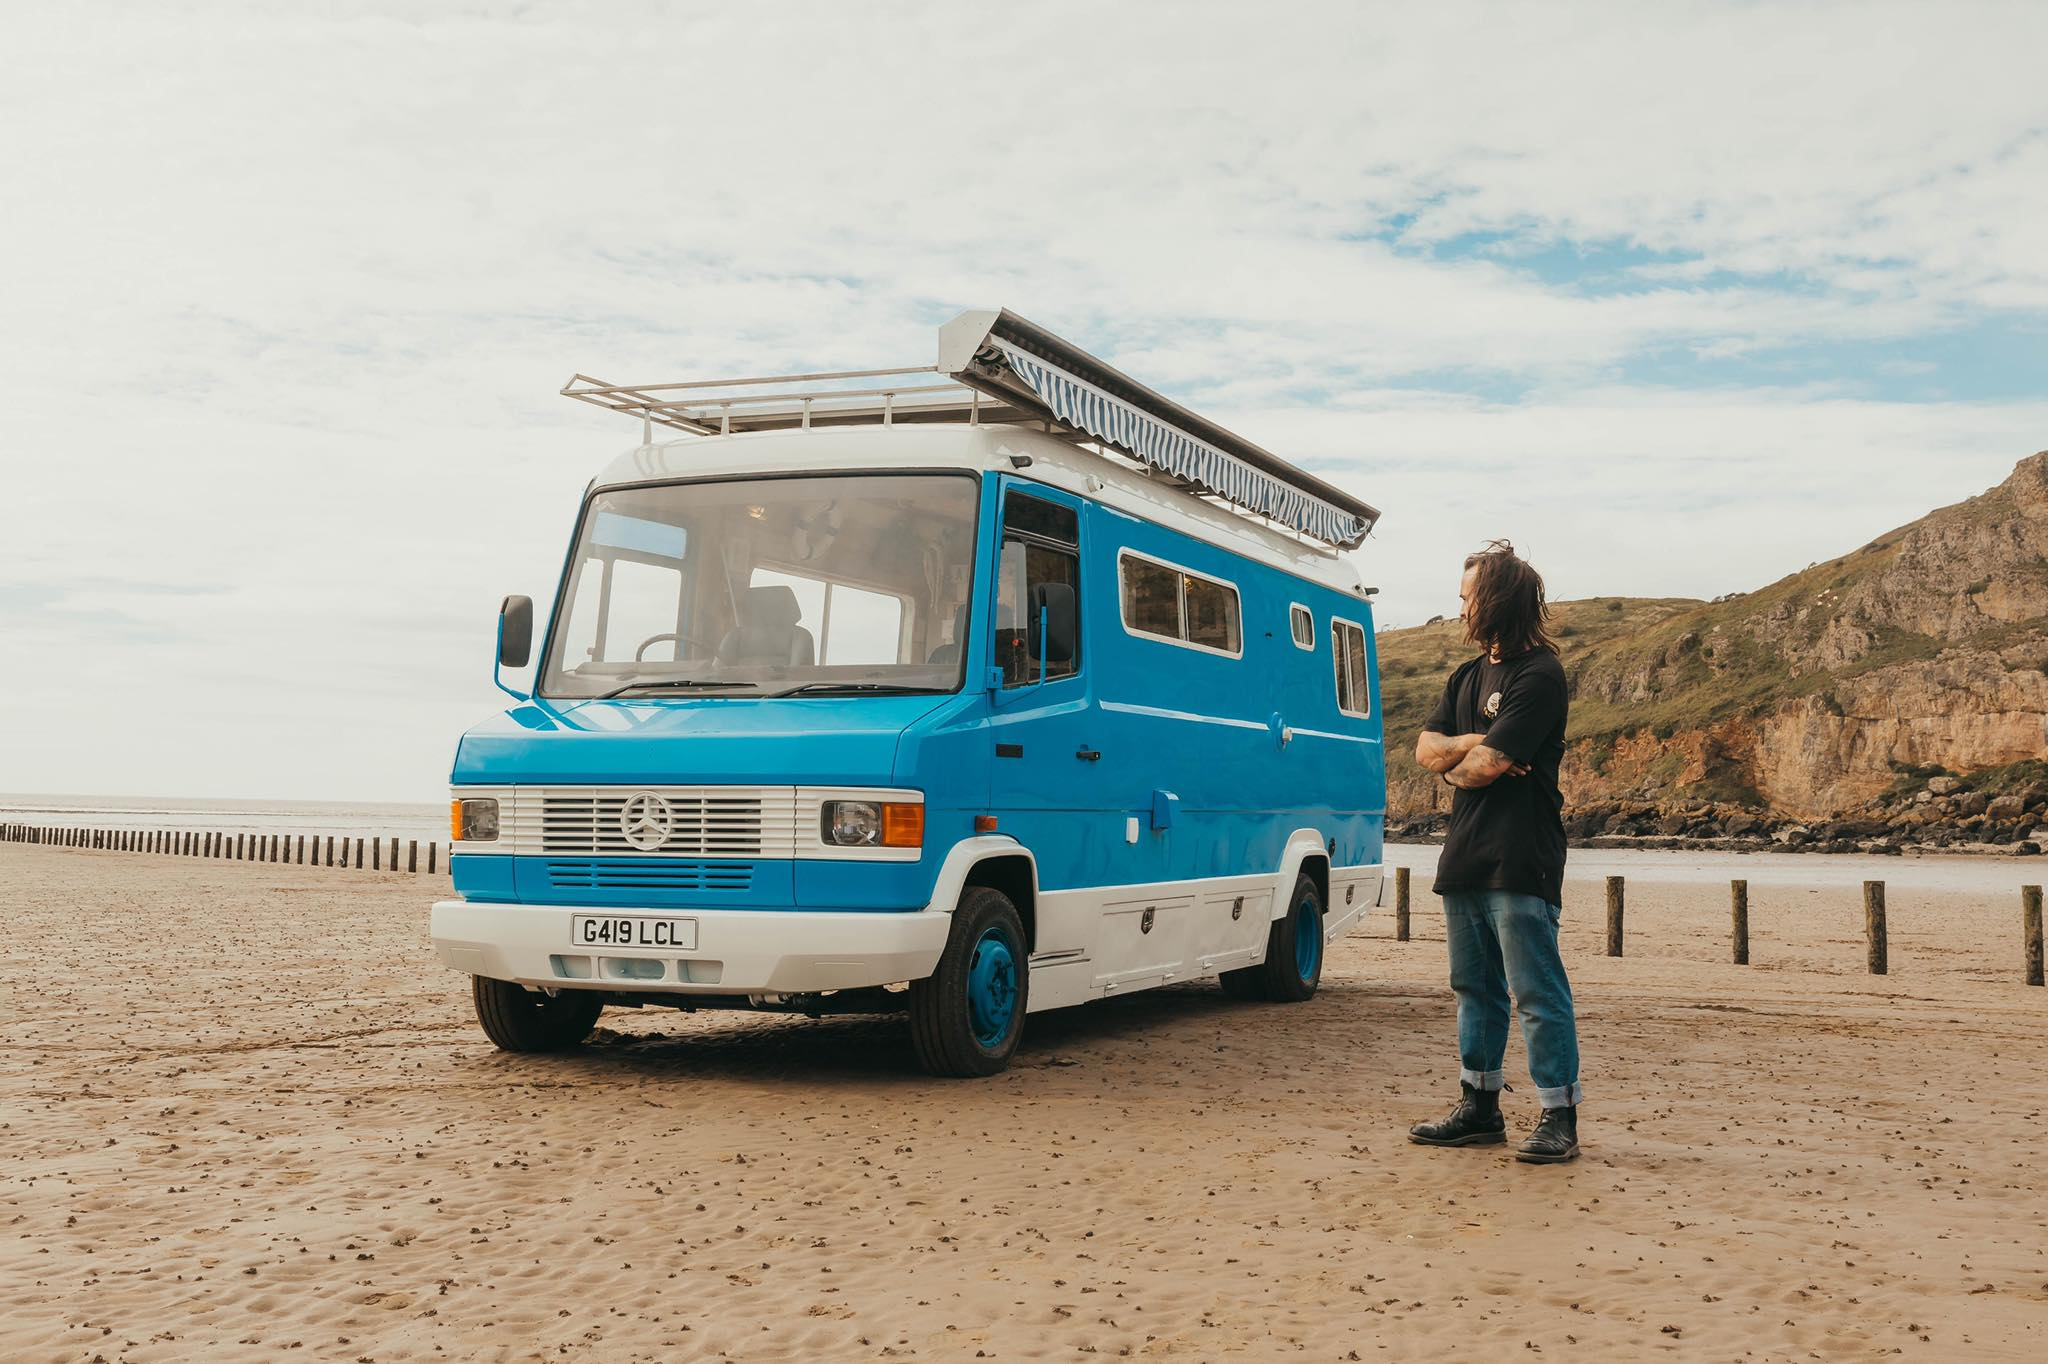 Ernie Supertramped Mercedes T2 Campervan on a beach